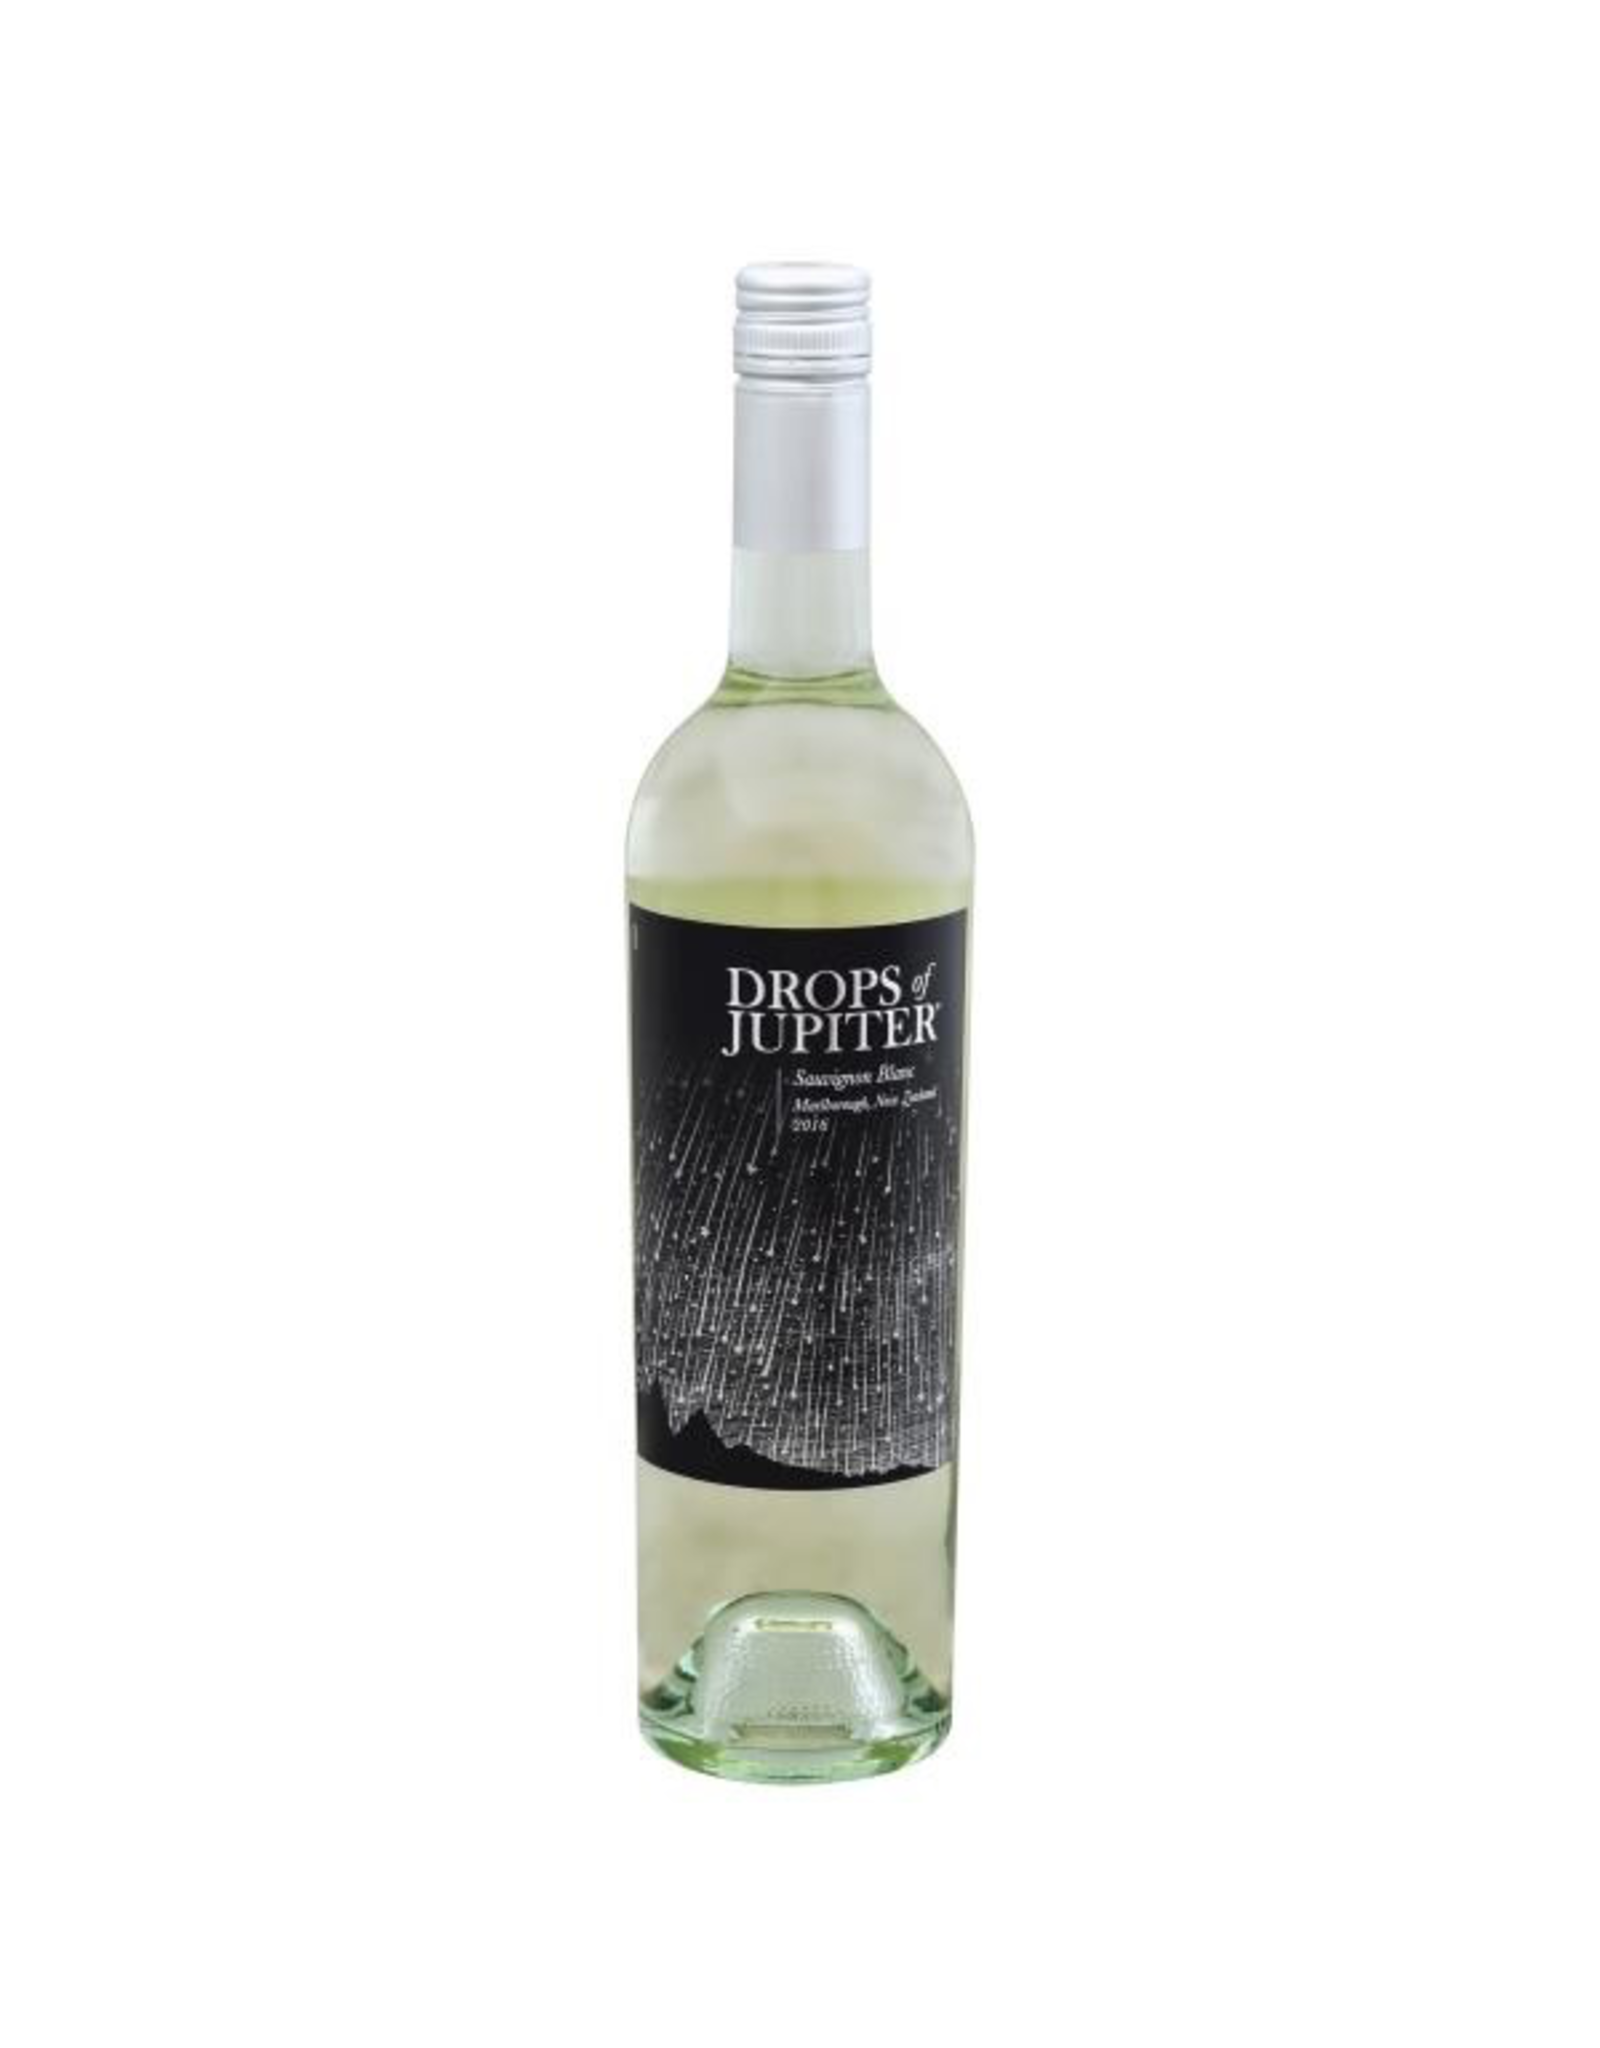 White Wine 2017, Drops of Jupiter, Sauvignon Blanc, Malborough, South Island, New Zealand, 12.5% Alc, CTnr, TW92